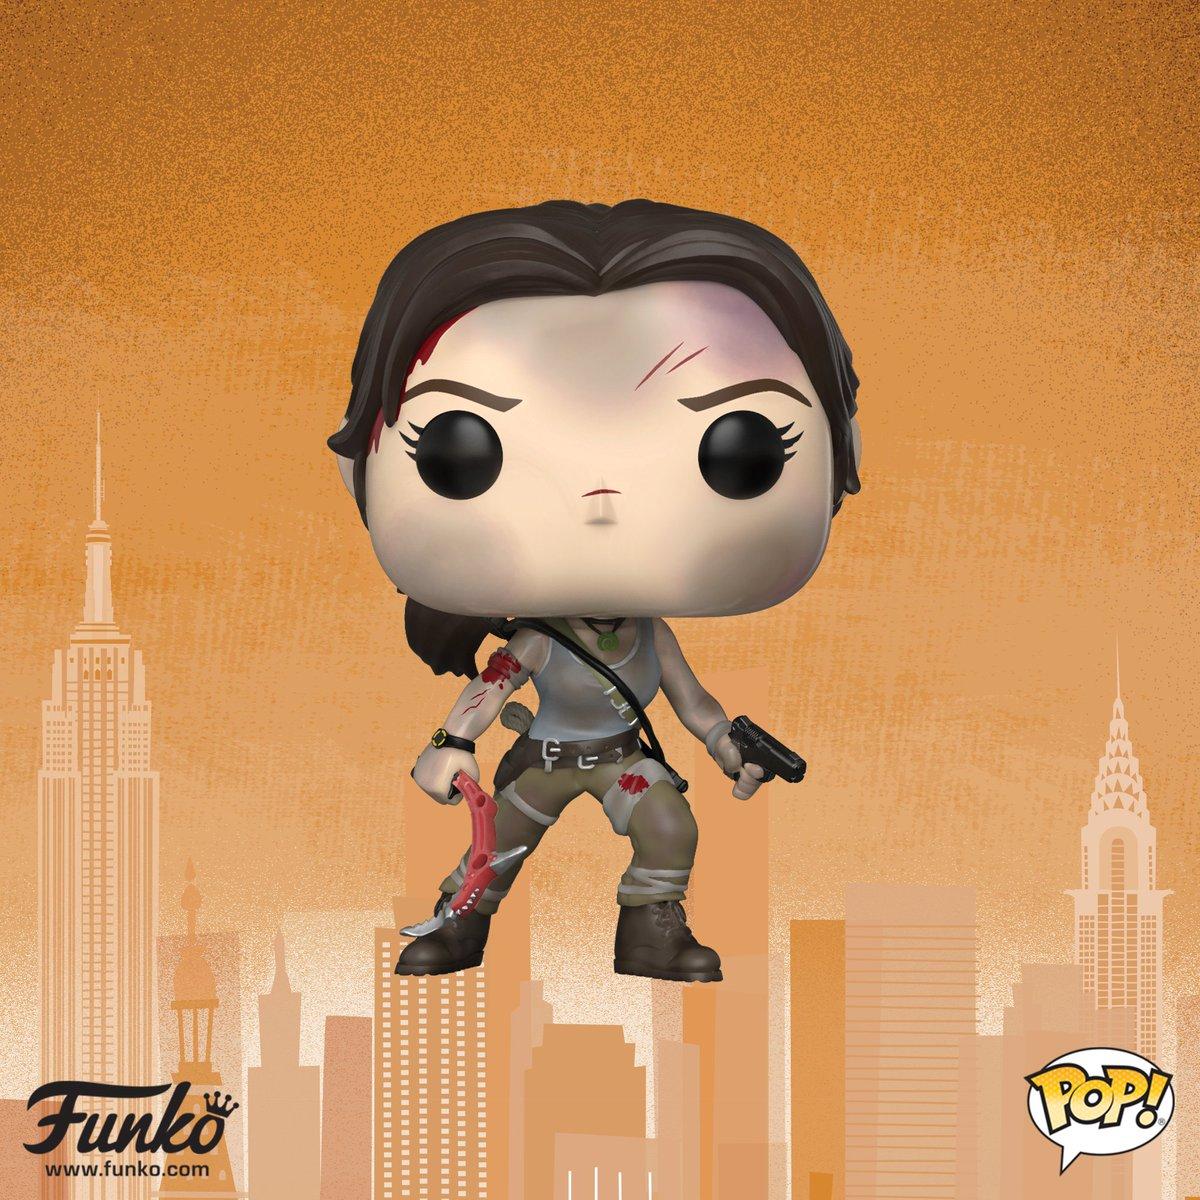 Toy Fair New York Reveals: Lara Croft! #...